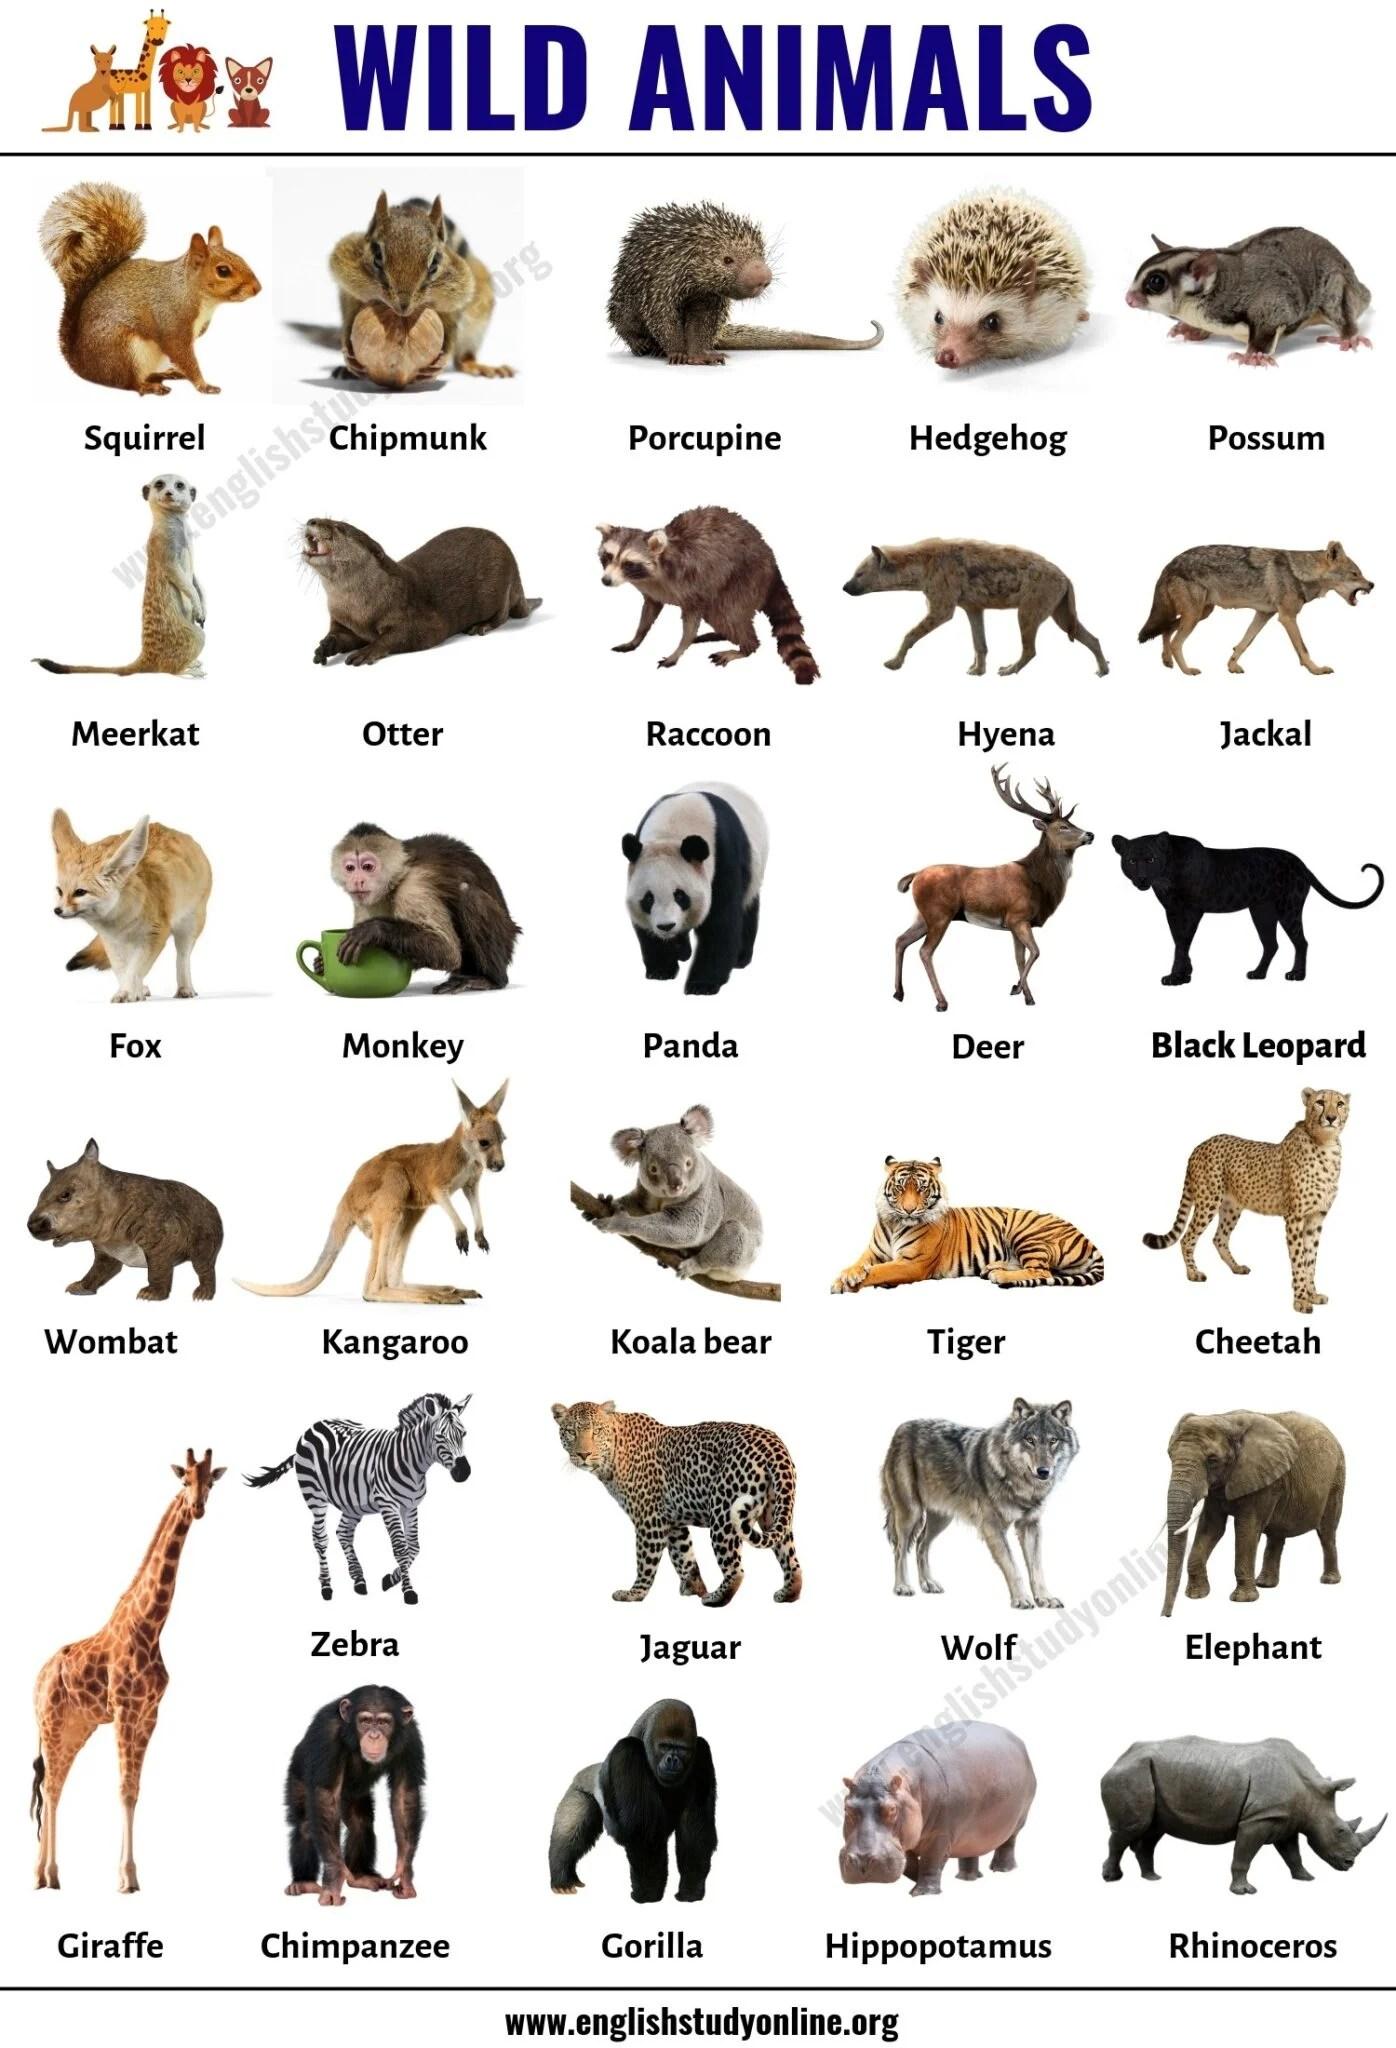 Wild Animals List Of 30 Popular Names Of Wild Animals In